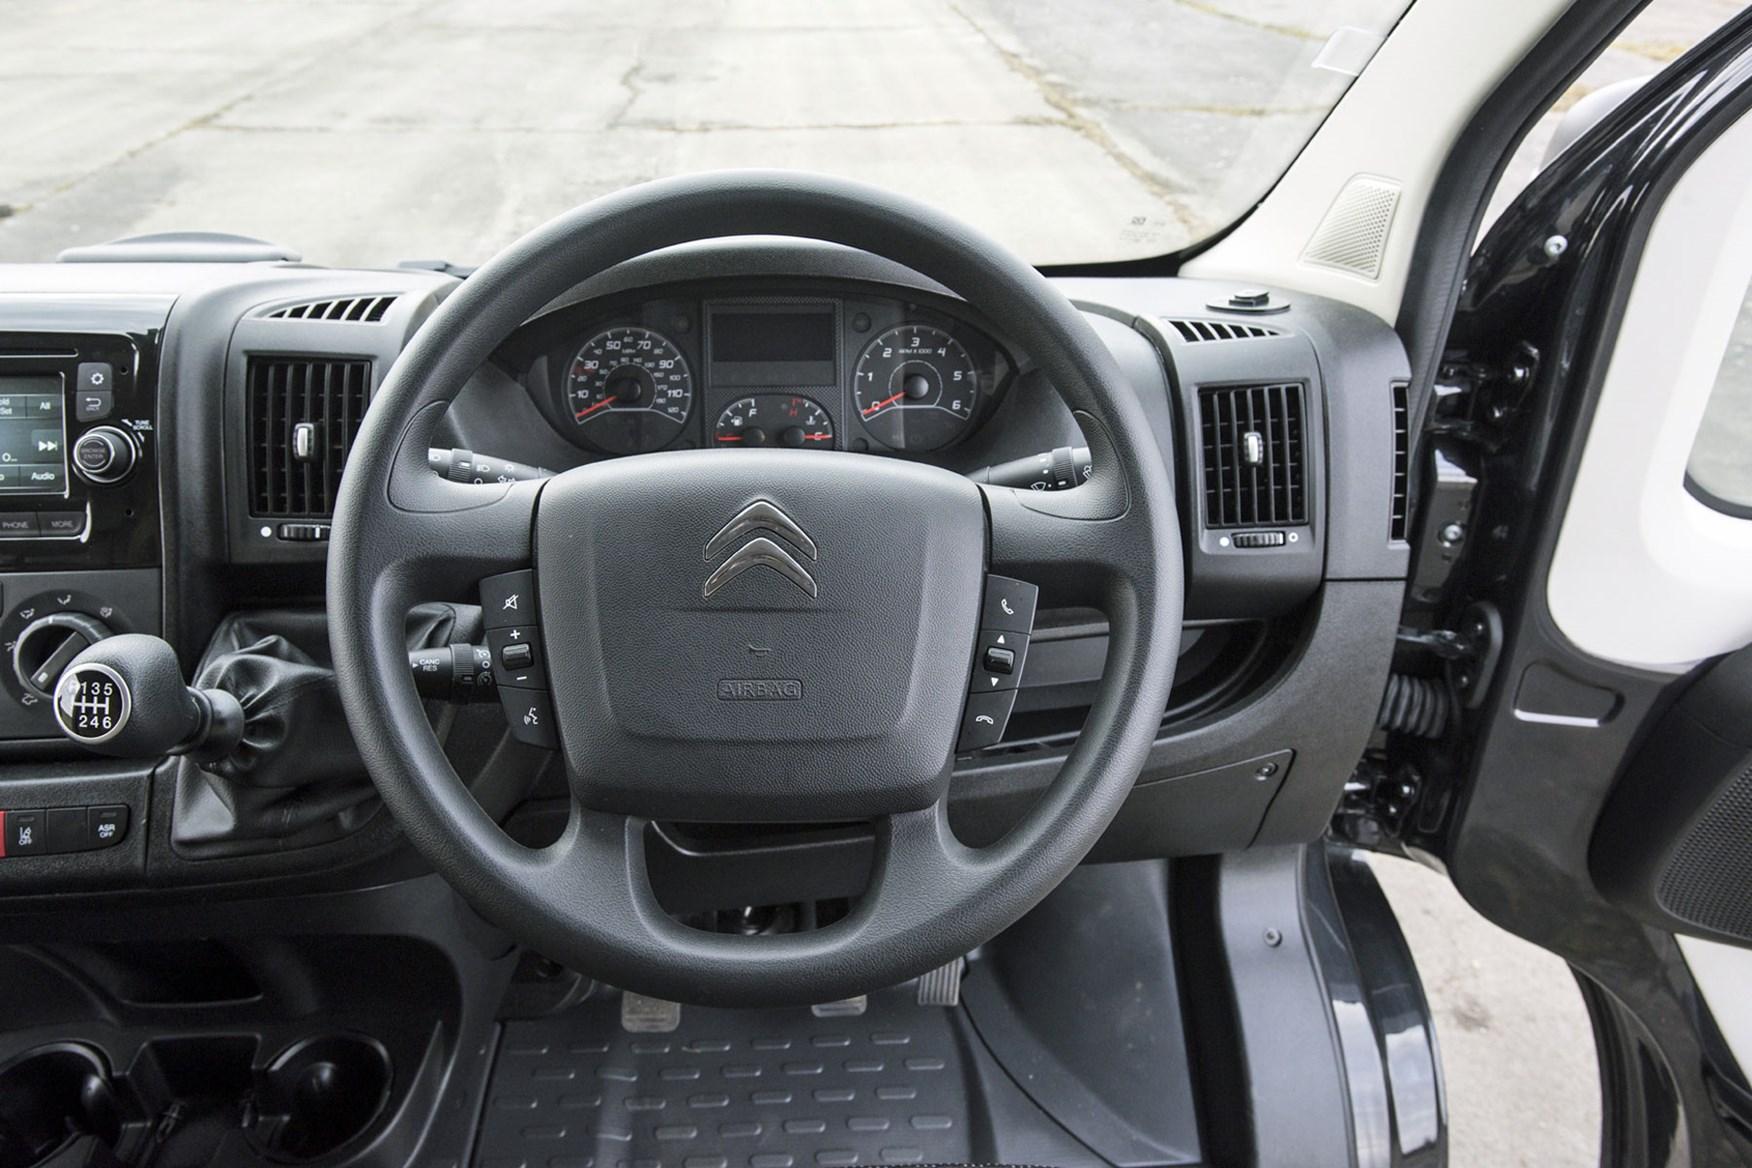 Citroen Relay review - cab interior, steering wheel